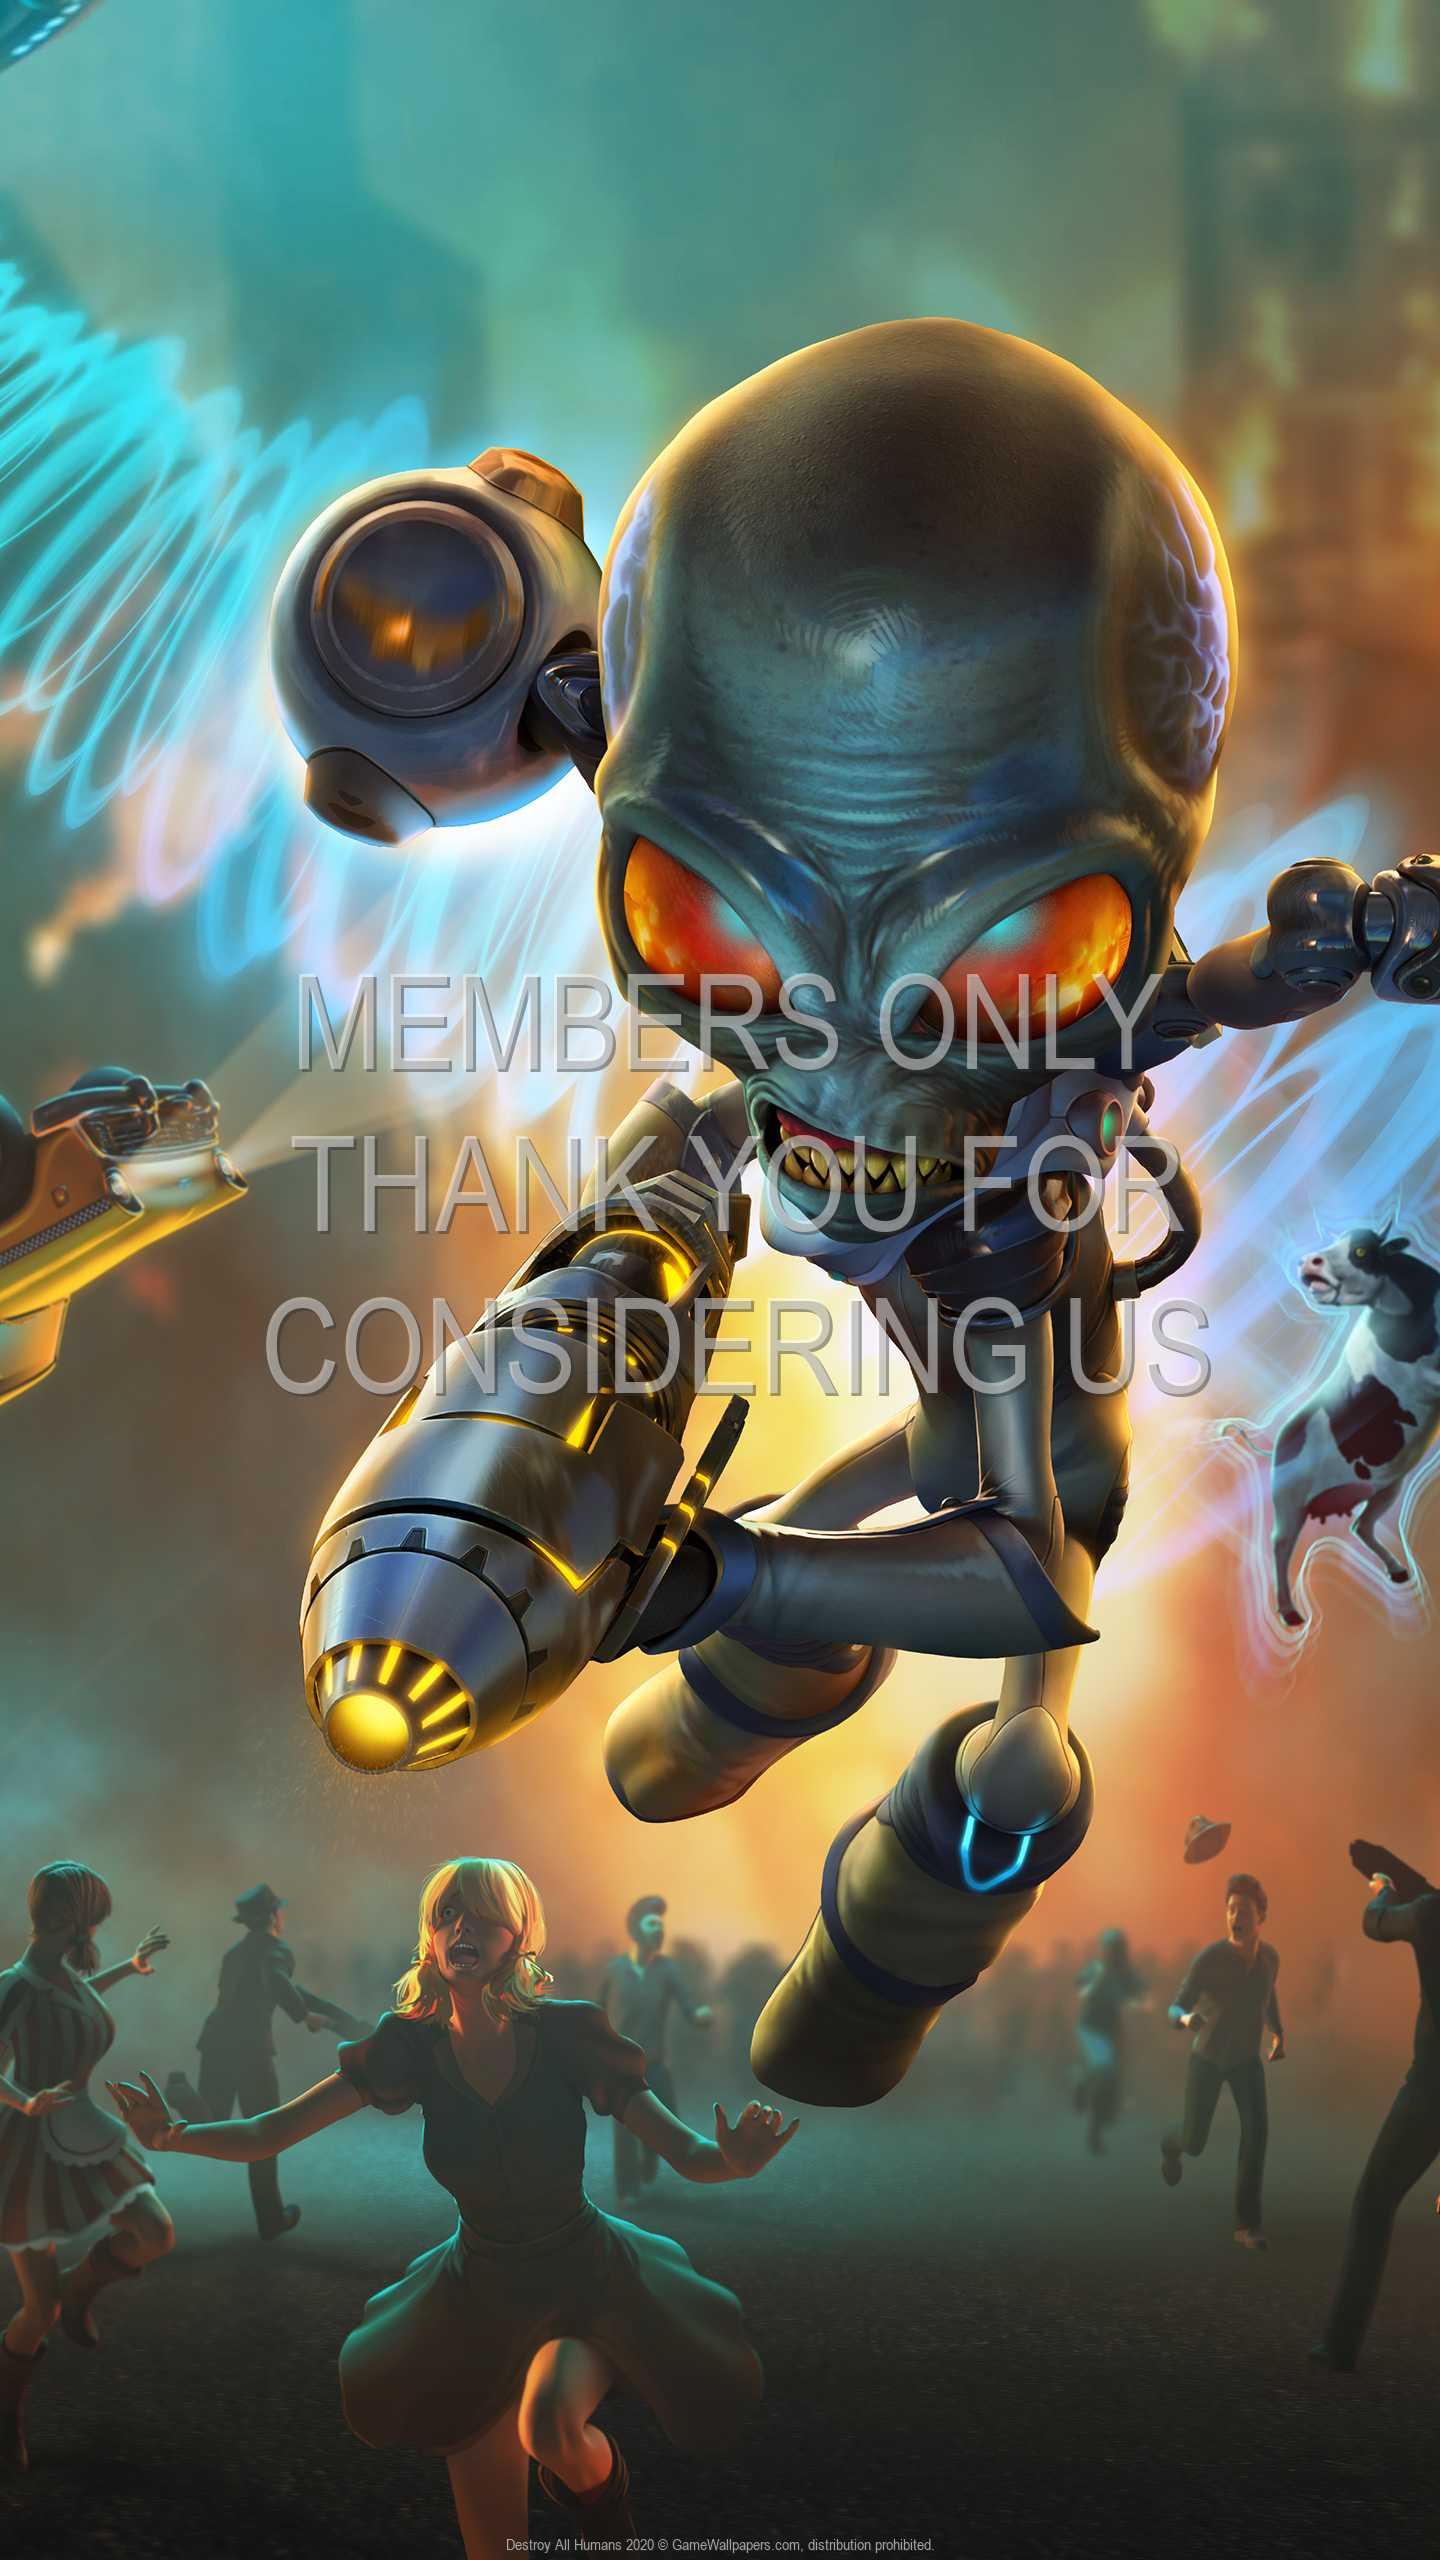 Destroy All Humans 2020 1440p Vertical Mobile wallpaper or background 01